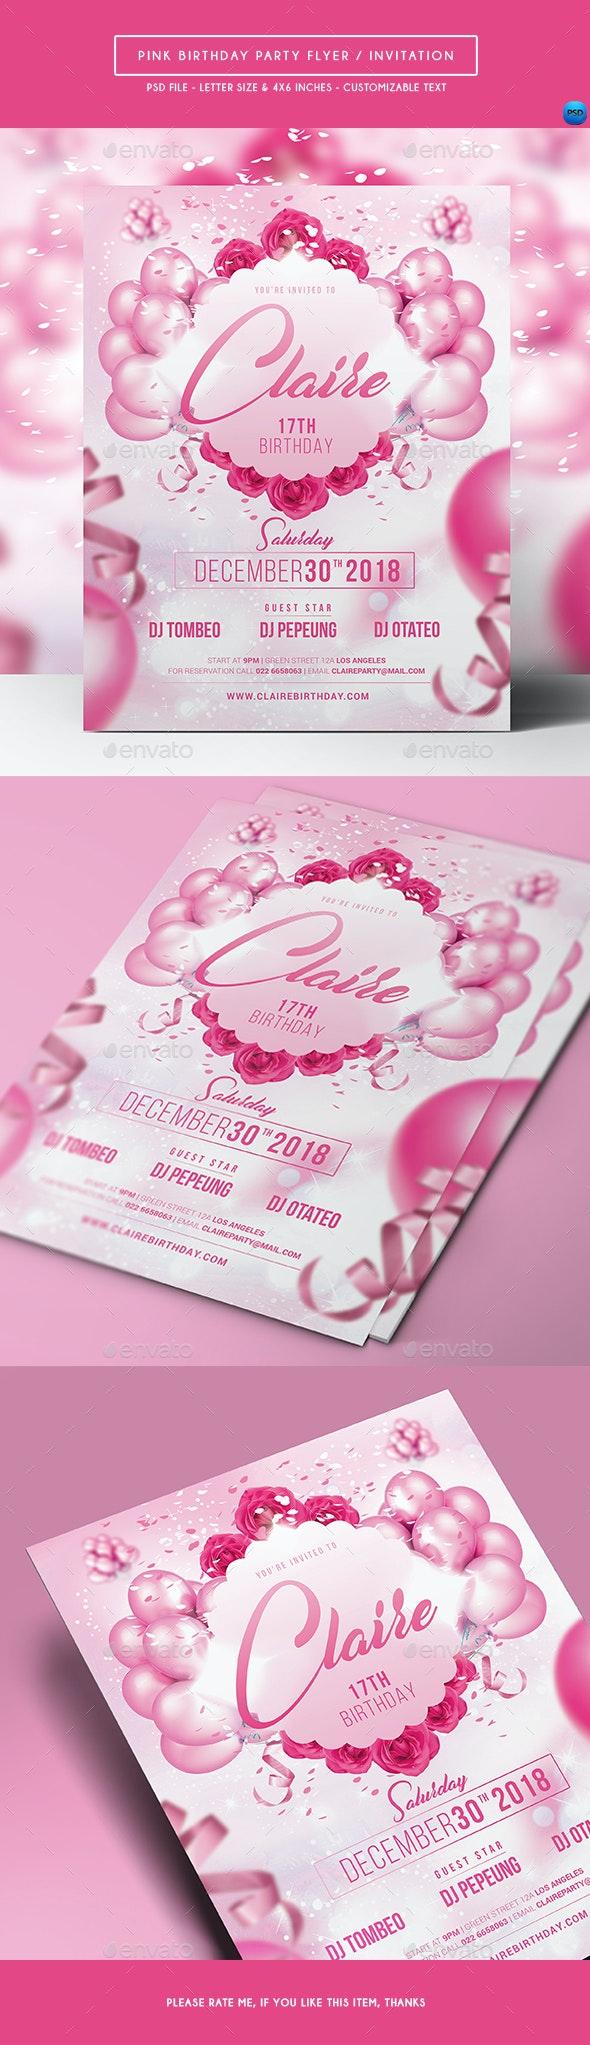 Pink Birthday Party Flyer / Invitation - Birthday Greeting Cards